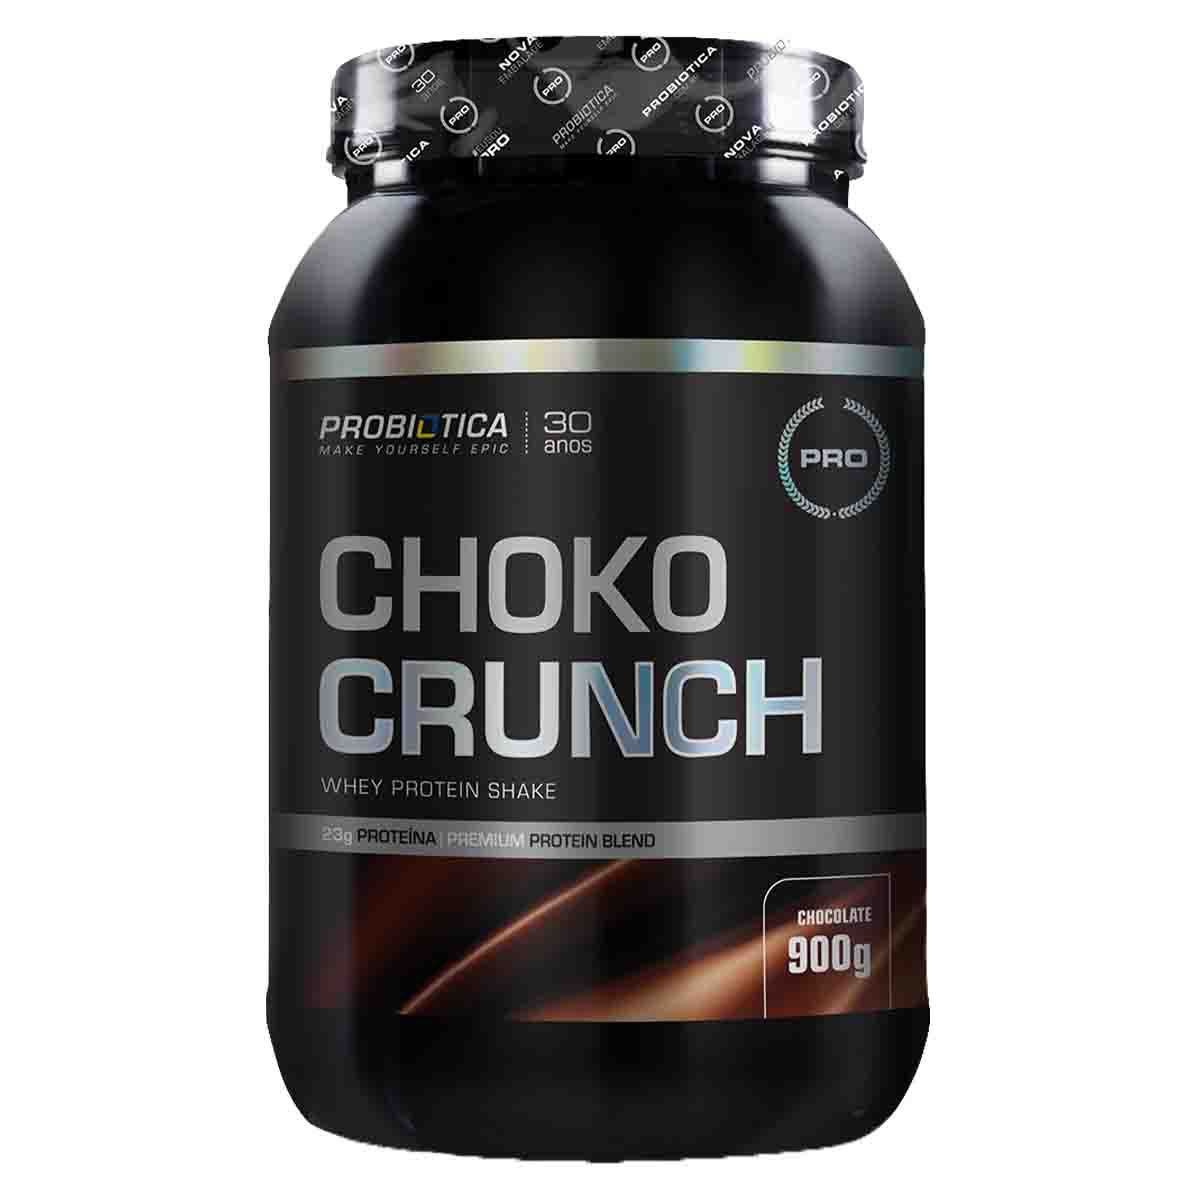 Choko Crunch Whey Protein Shake 900g - Probiótica